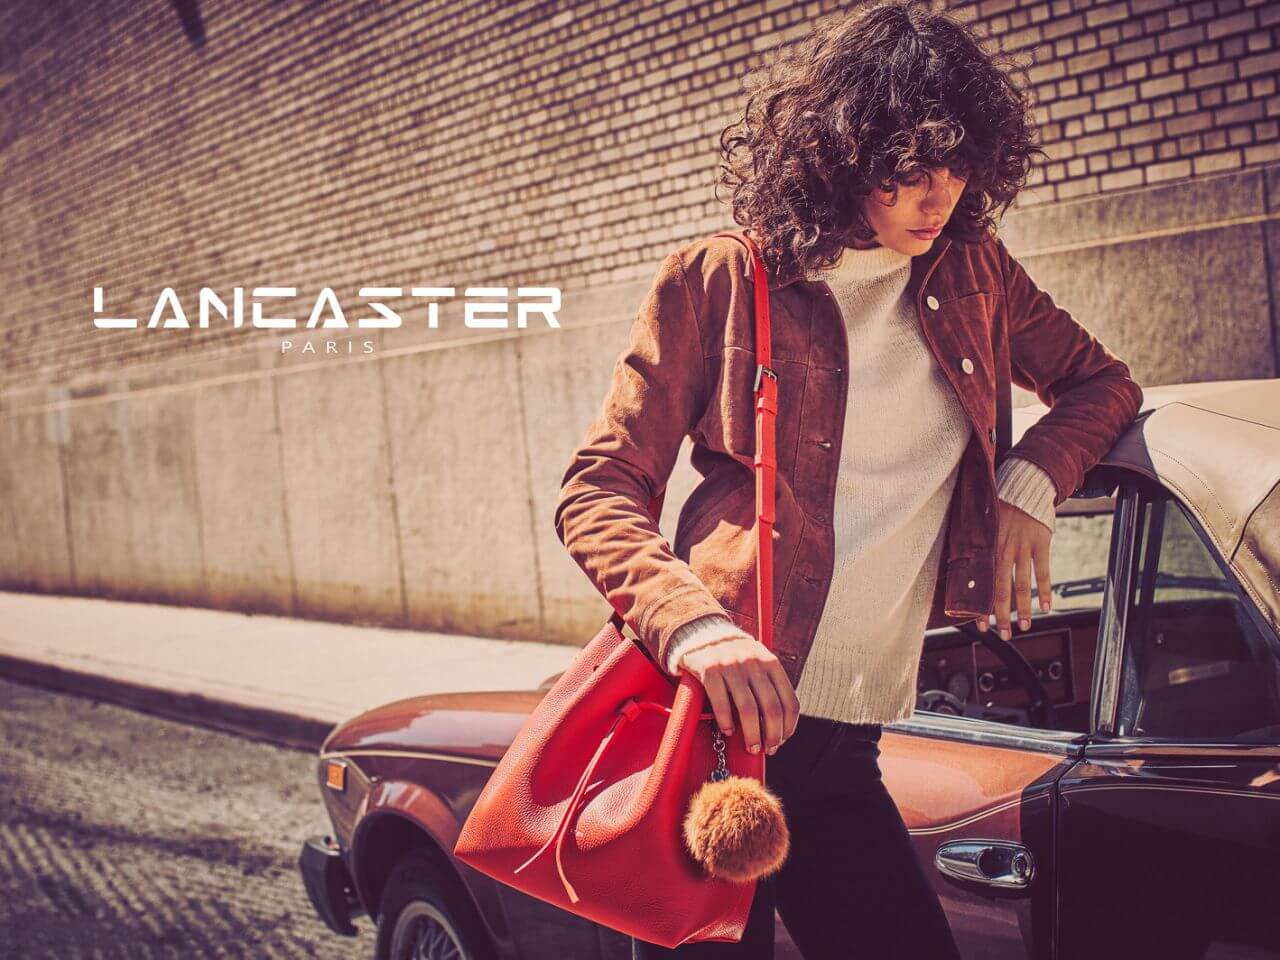 Steffy Argelich for Lancaster Paris